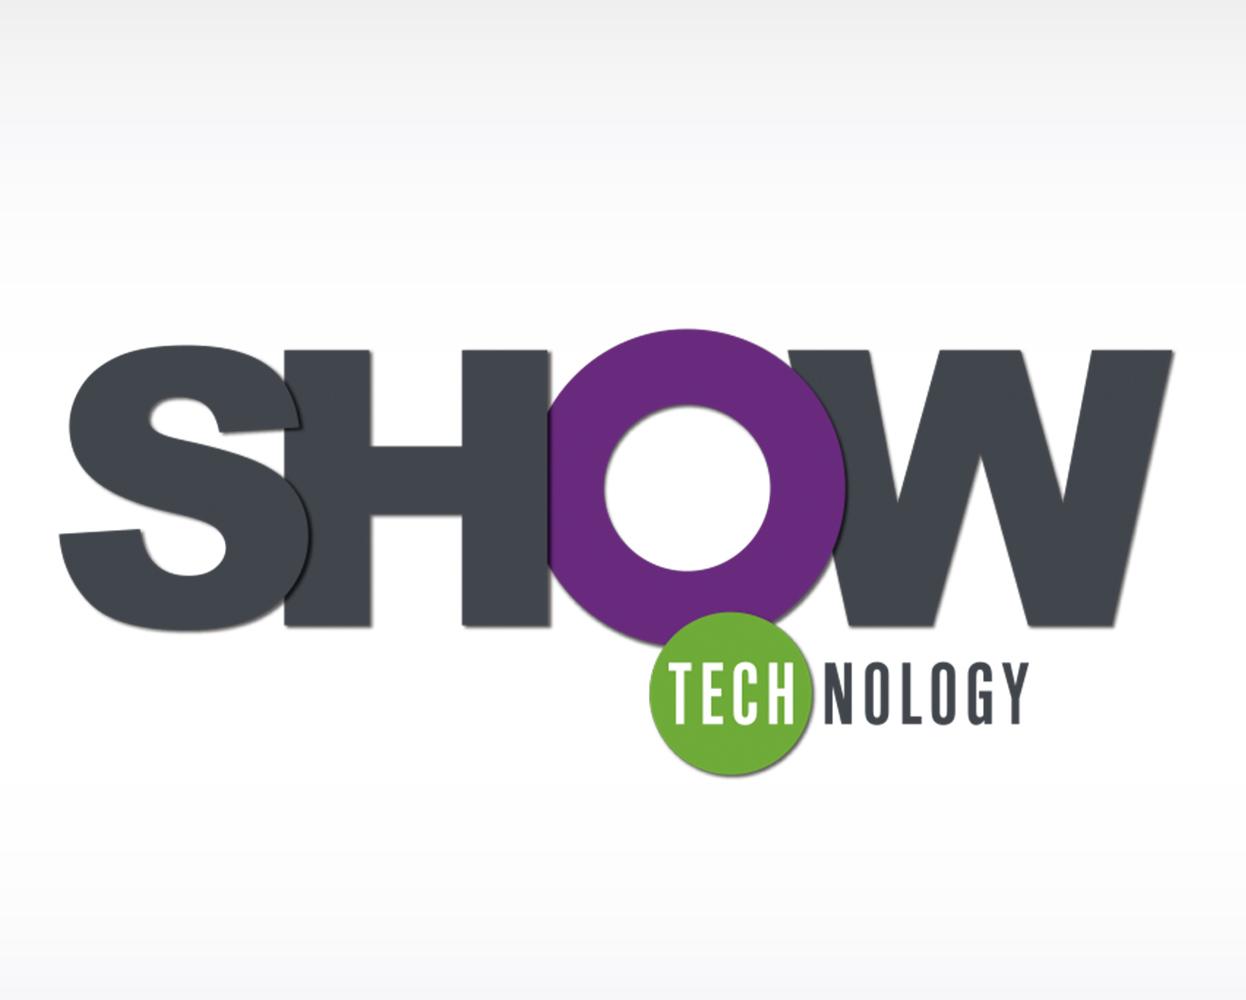 Show_Technology_branding_logo